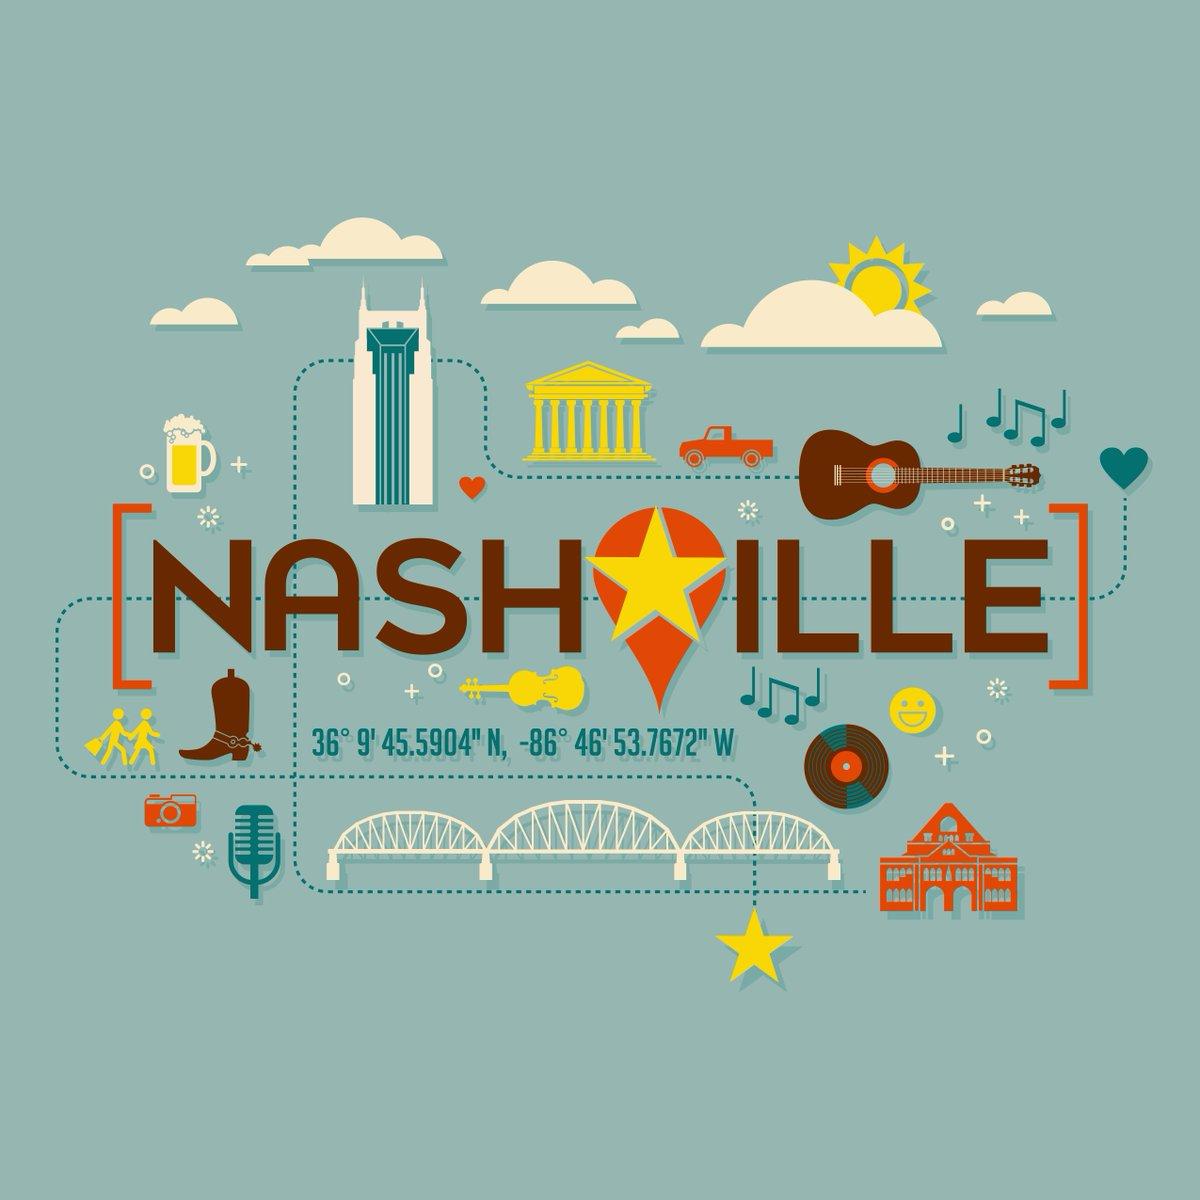 Can't help but notice the beer stein on this photo! Nashville is amazing and loves beer.🙌  #lovebeer #nash #beerstein #friday #tgif #weekend #weekendvibes #nashvillescene  #nashvilleoktoberfest #germanbeer #craftbeer #beer #oktoberfest #nashville #nashvilletn #nashokt